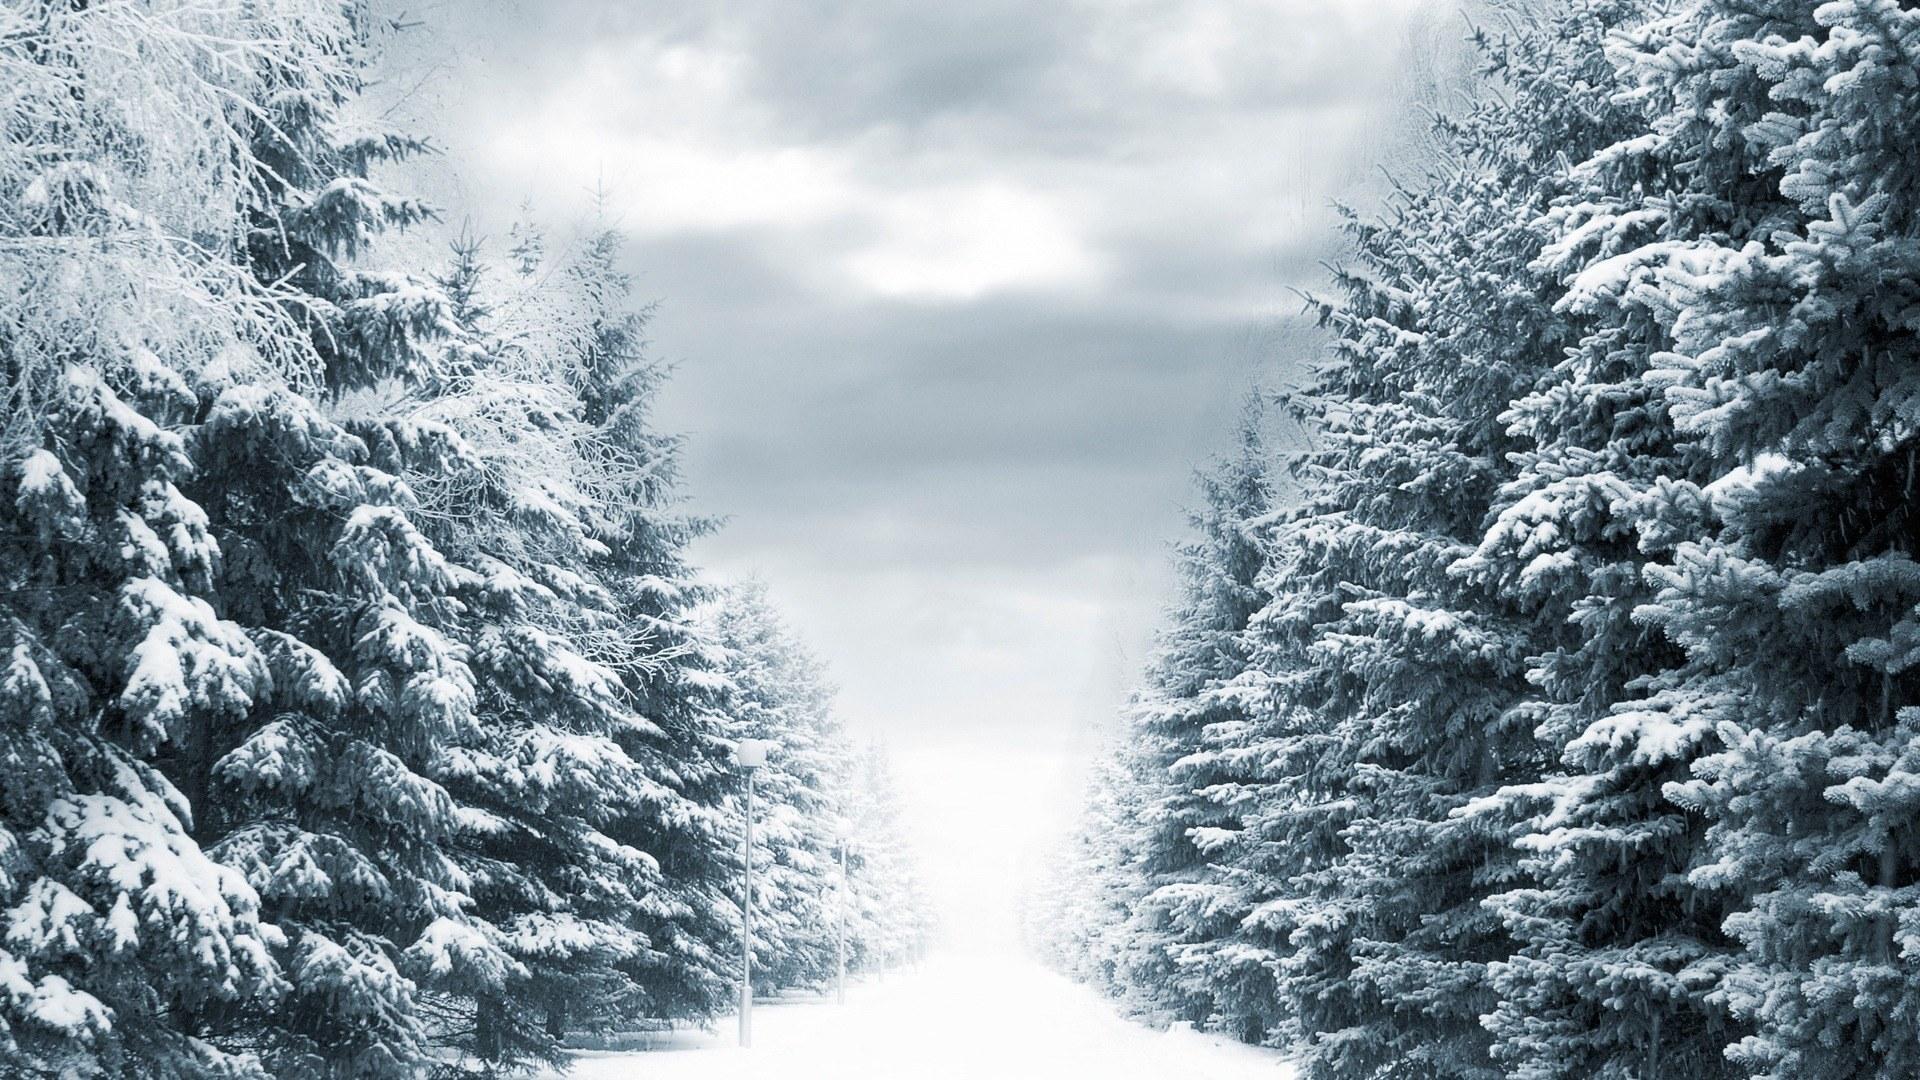 Wallpaper ไหนว่าปีนี้จะหนาวสุดในรอบ 30 ปี 50 Pic 230389-Sepik